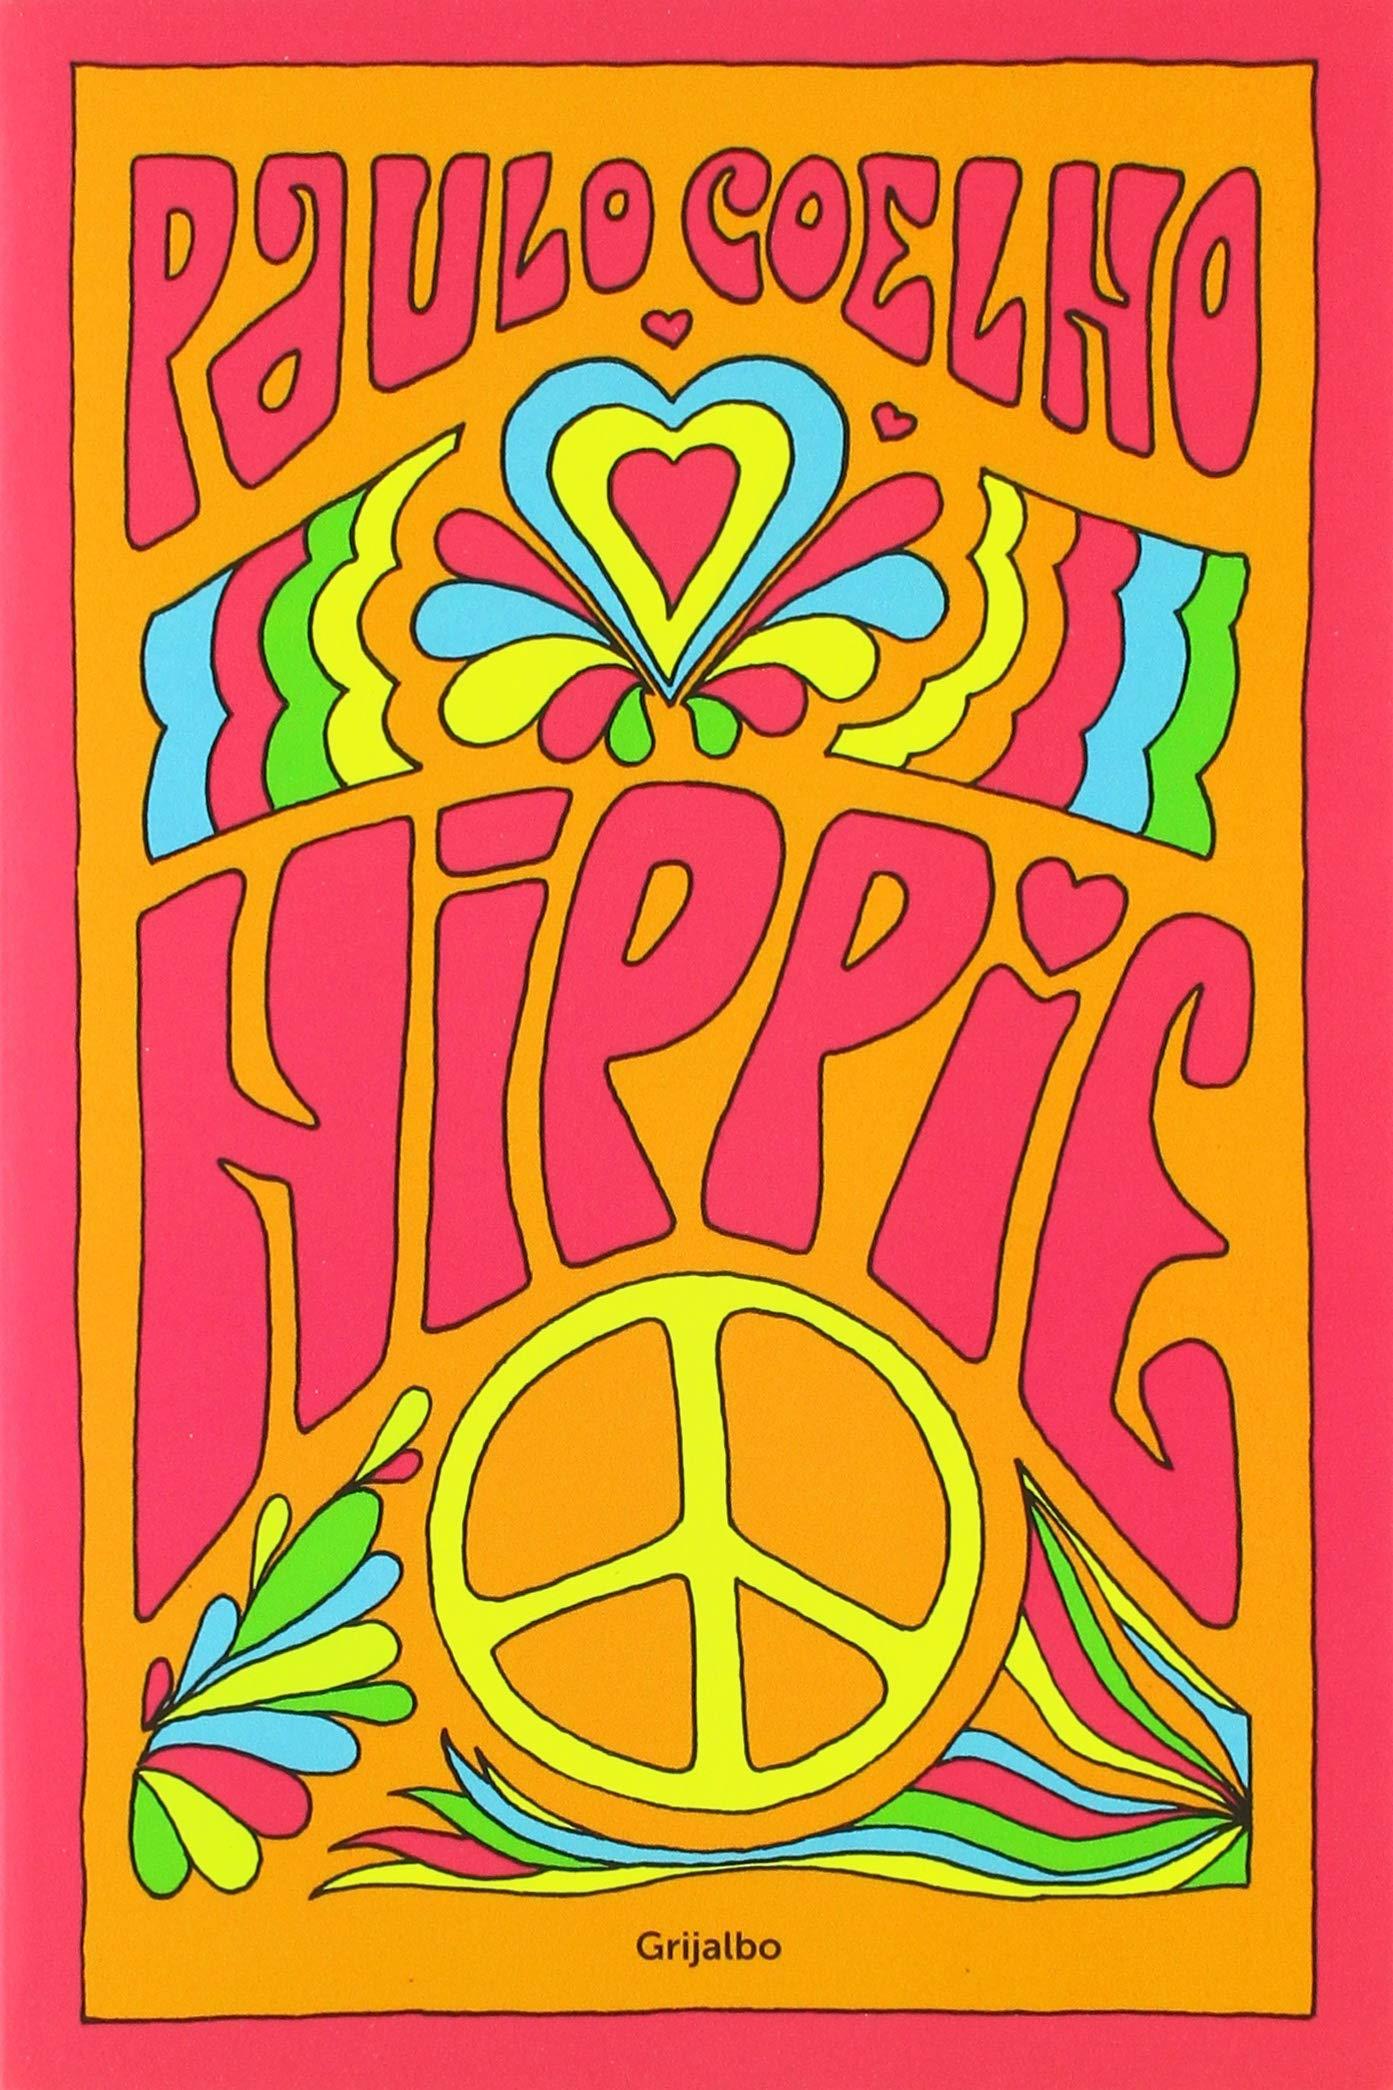 Hippie(Spanish Edition): Paulo Coelho: 9781947783959: Amazon ...